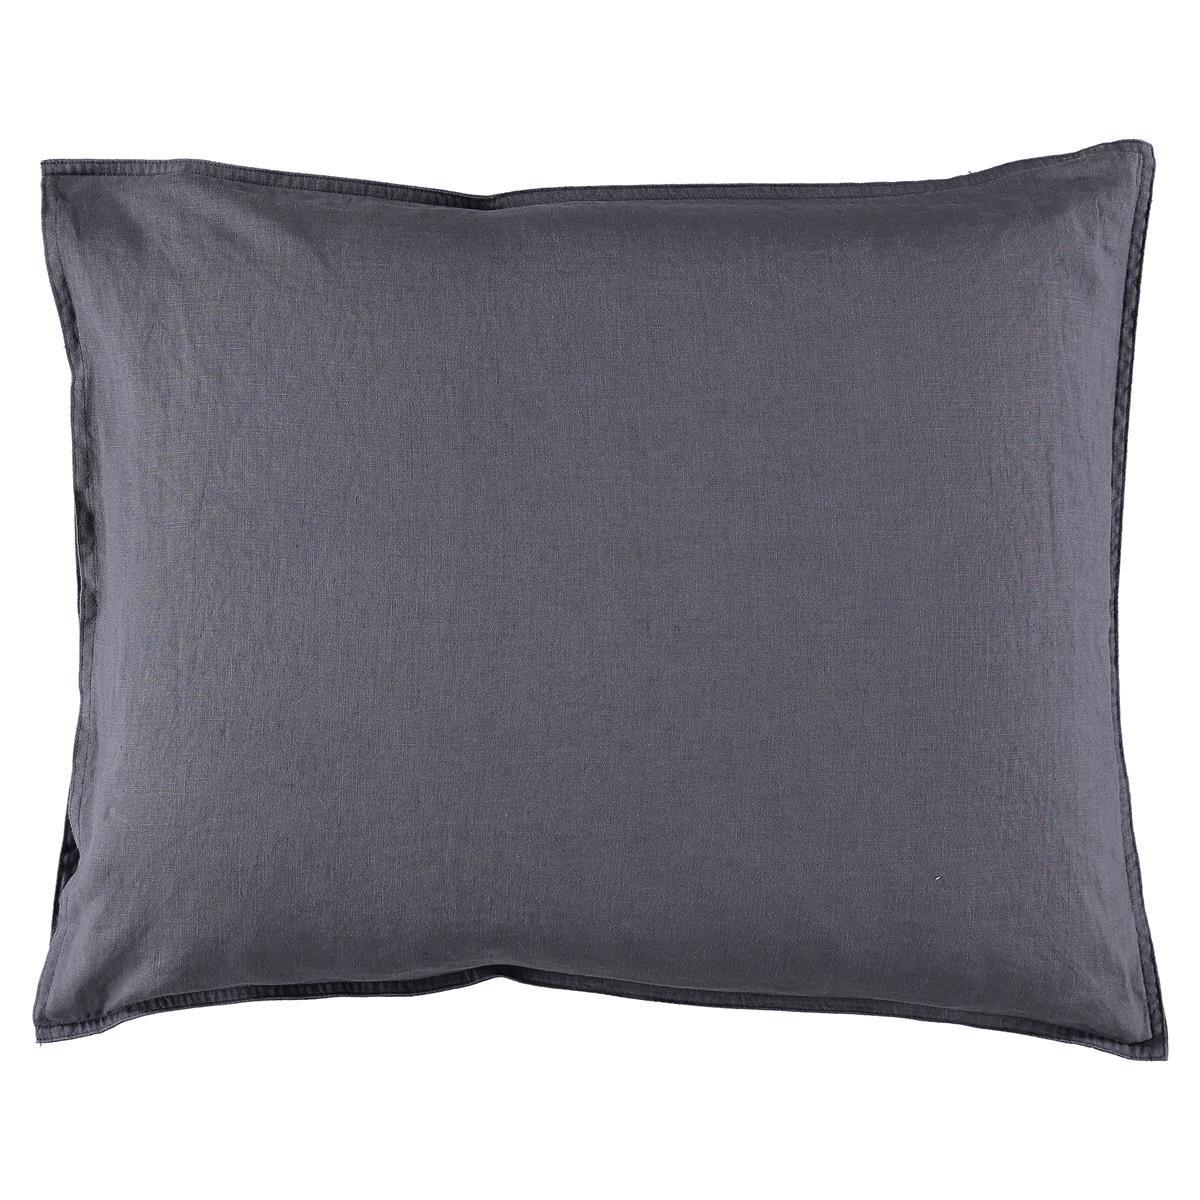 Gripsholm Washed Linen Pillowcase 50x60 cm, Ombre Blue